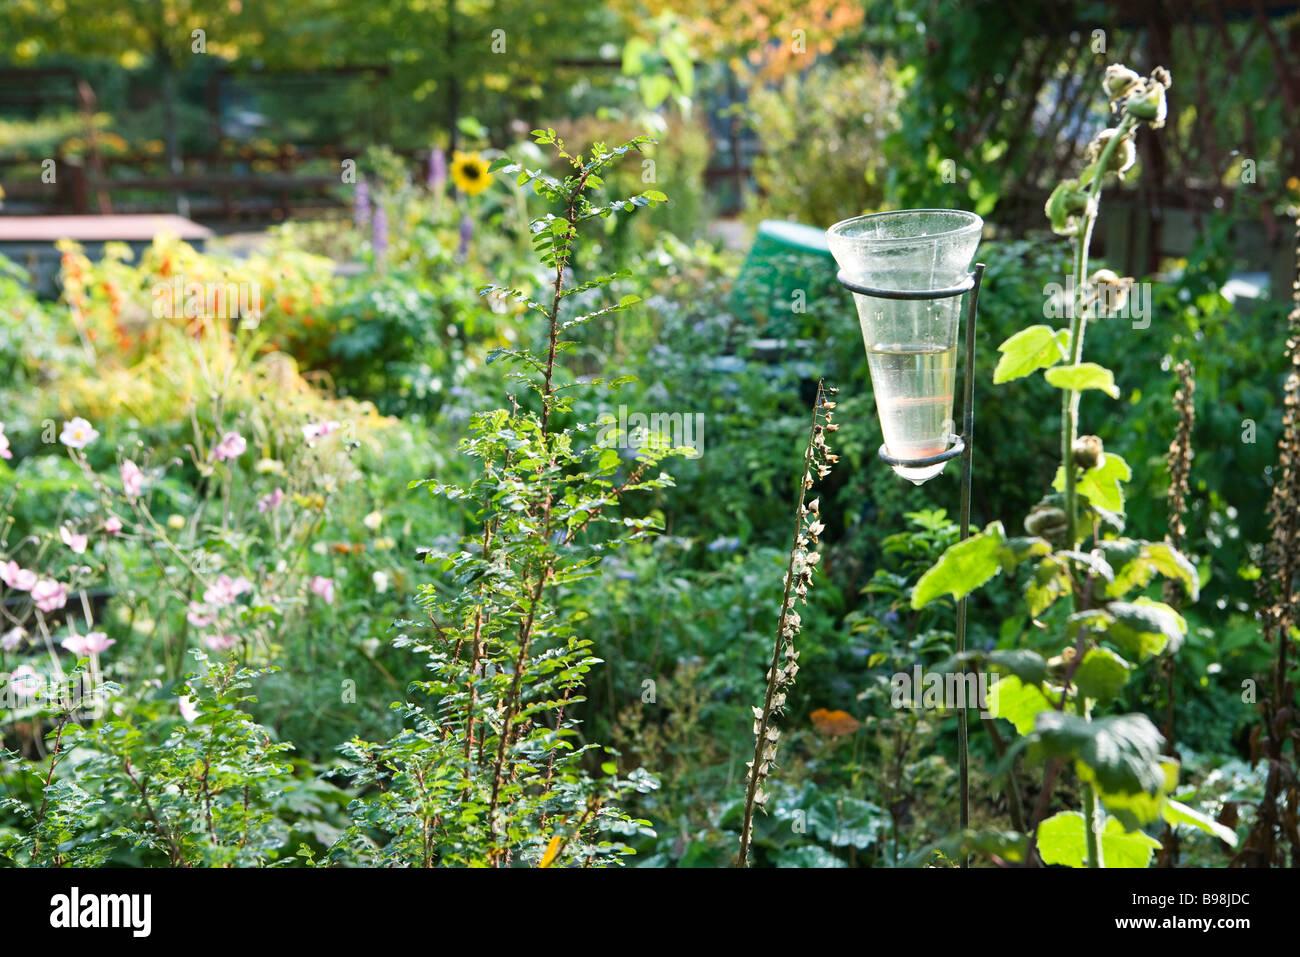 Rain gauge in garden - Stock Image